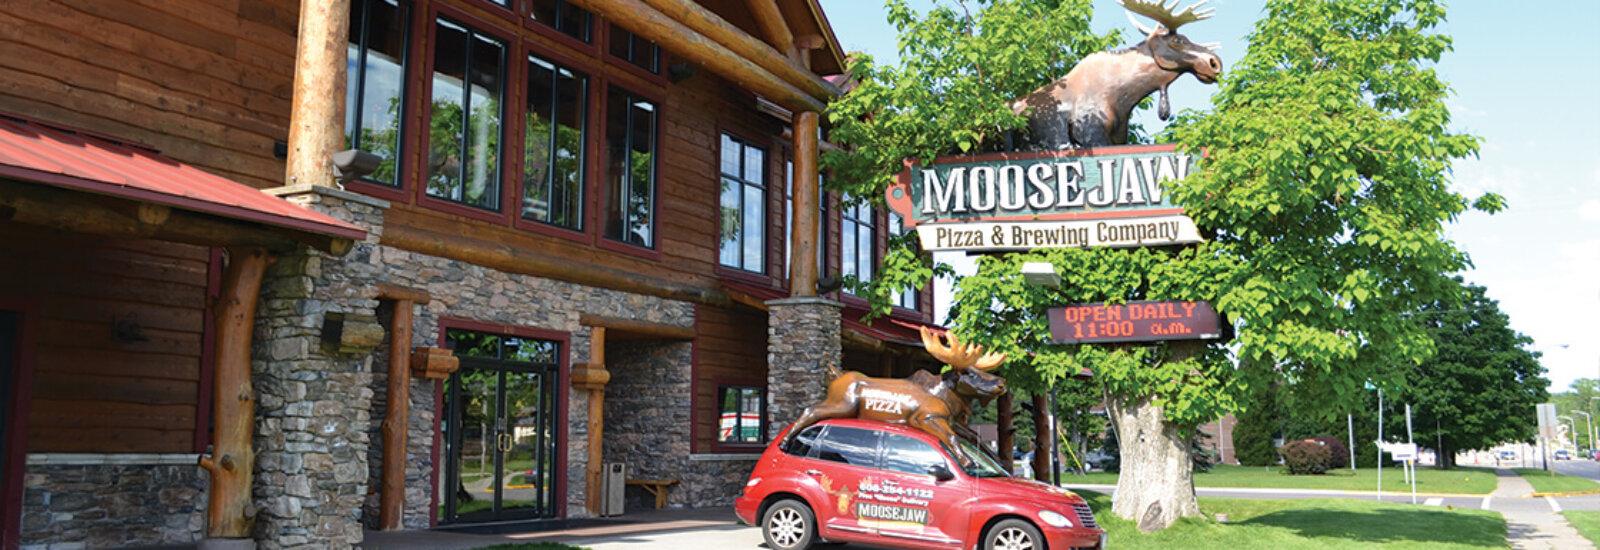 Moose-Mobile